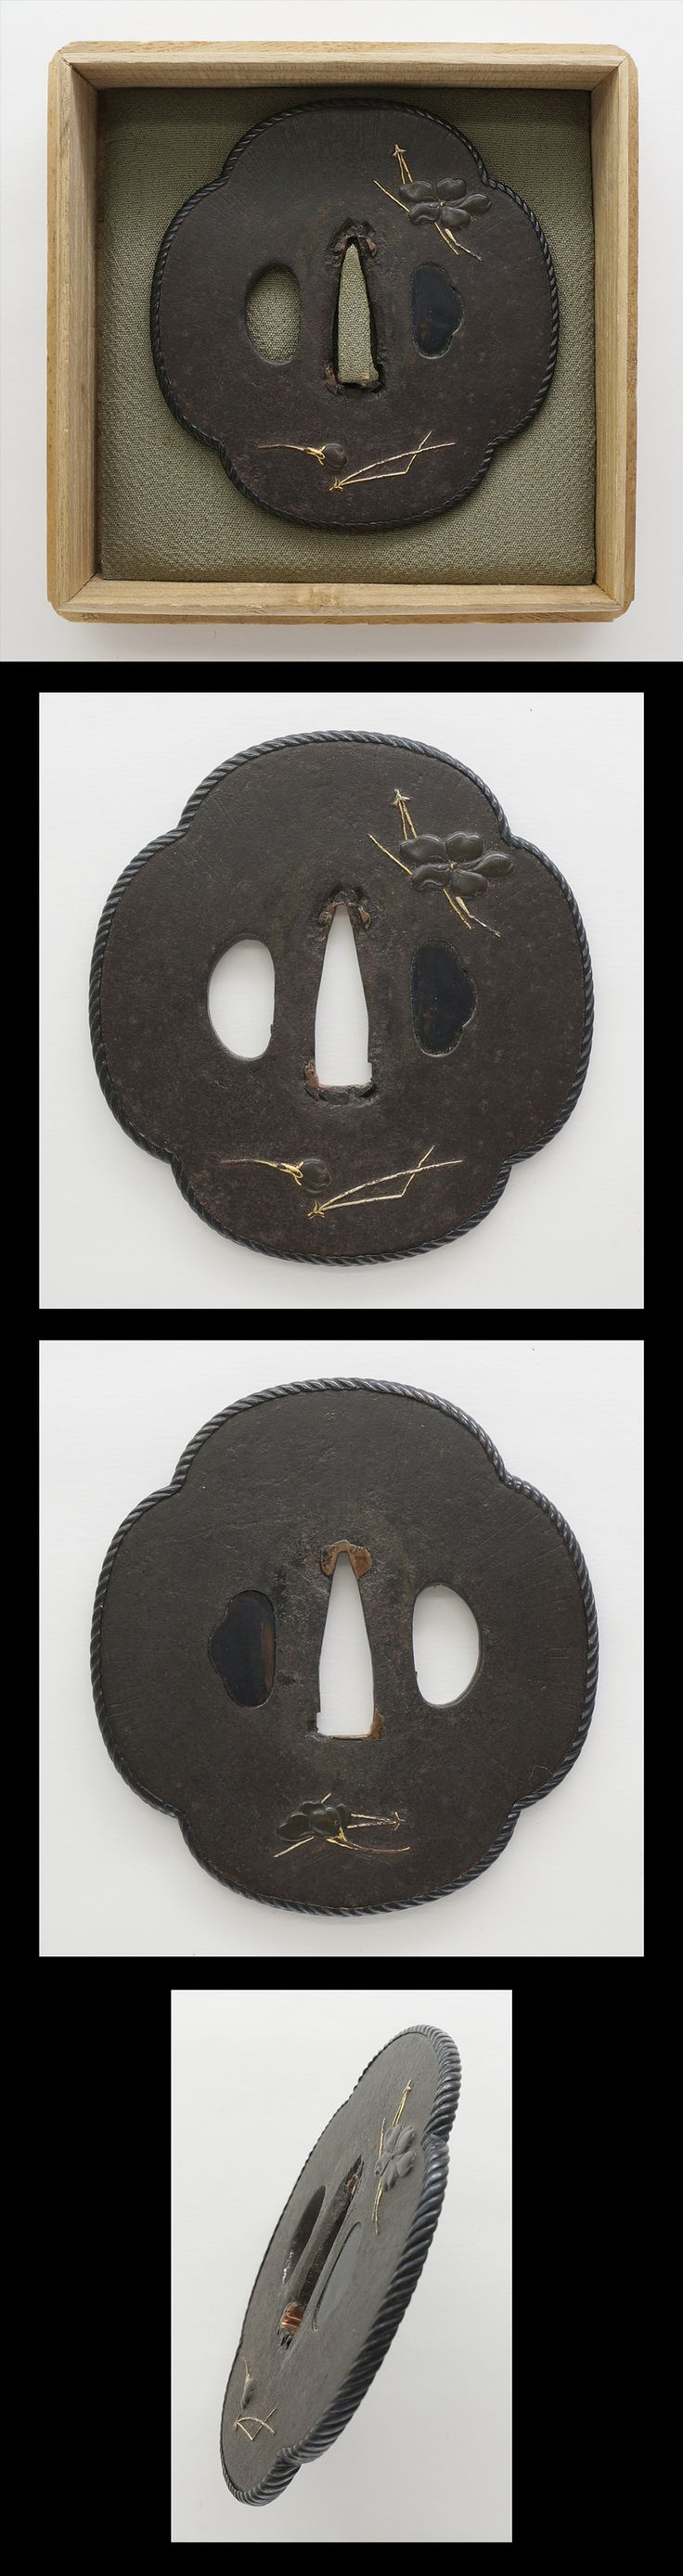 Tsuba: Mumei(Unsigned) Cherryblossom and Pine Leaf Design | Japanese Sword Shop Aoi-Art.